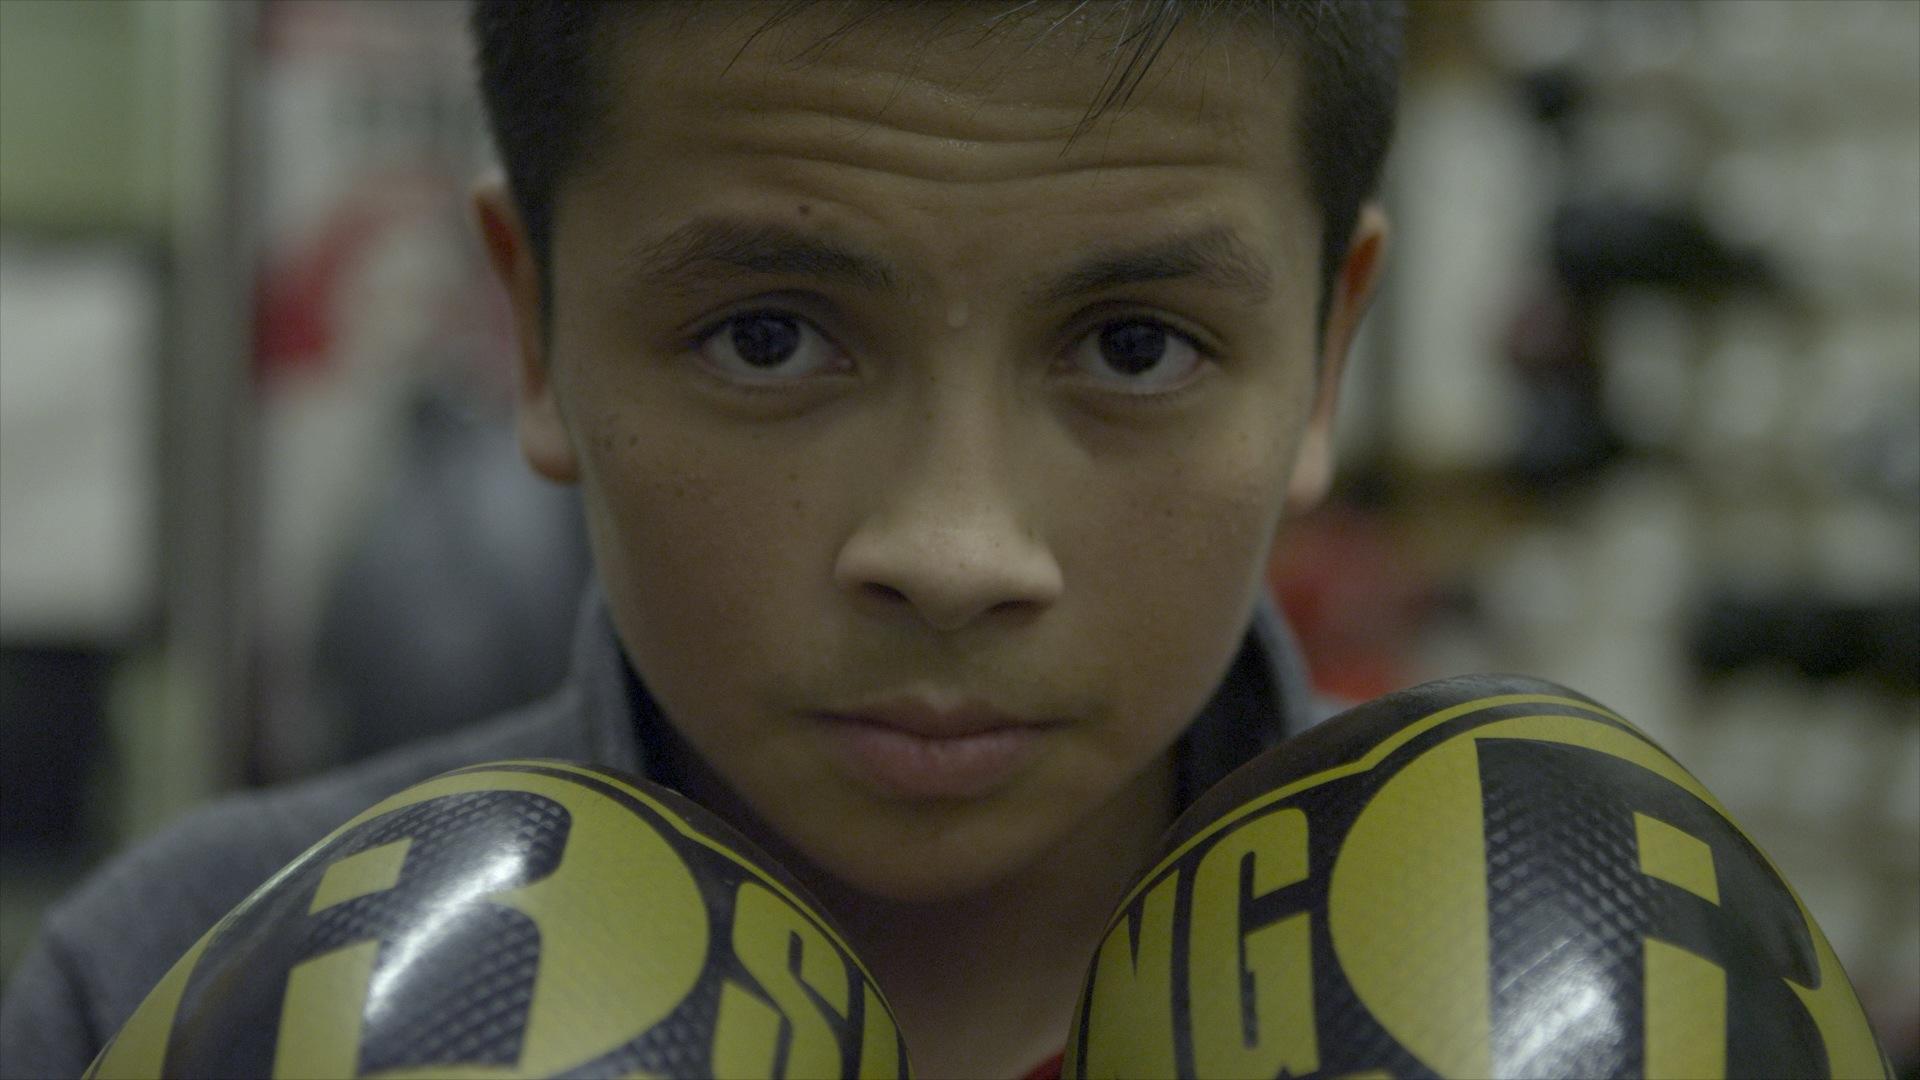 Willie Gomez, 14